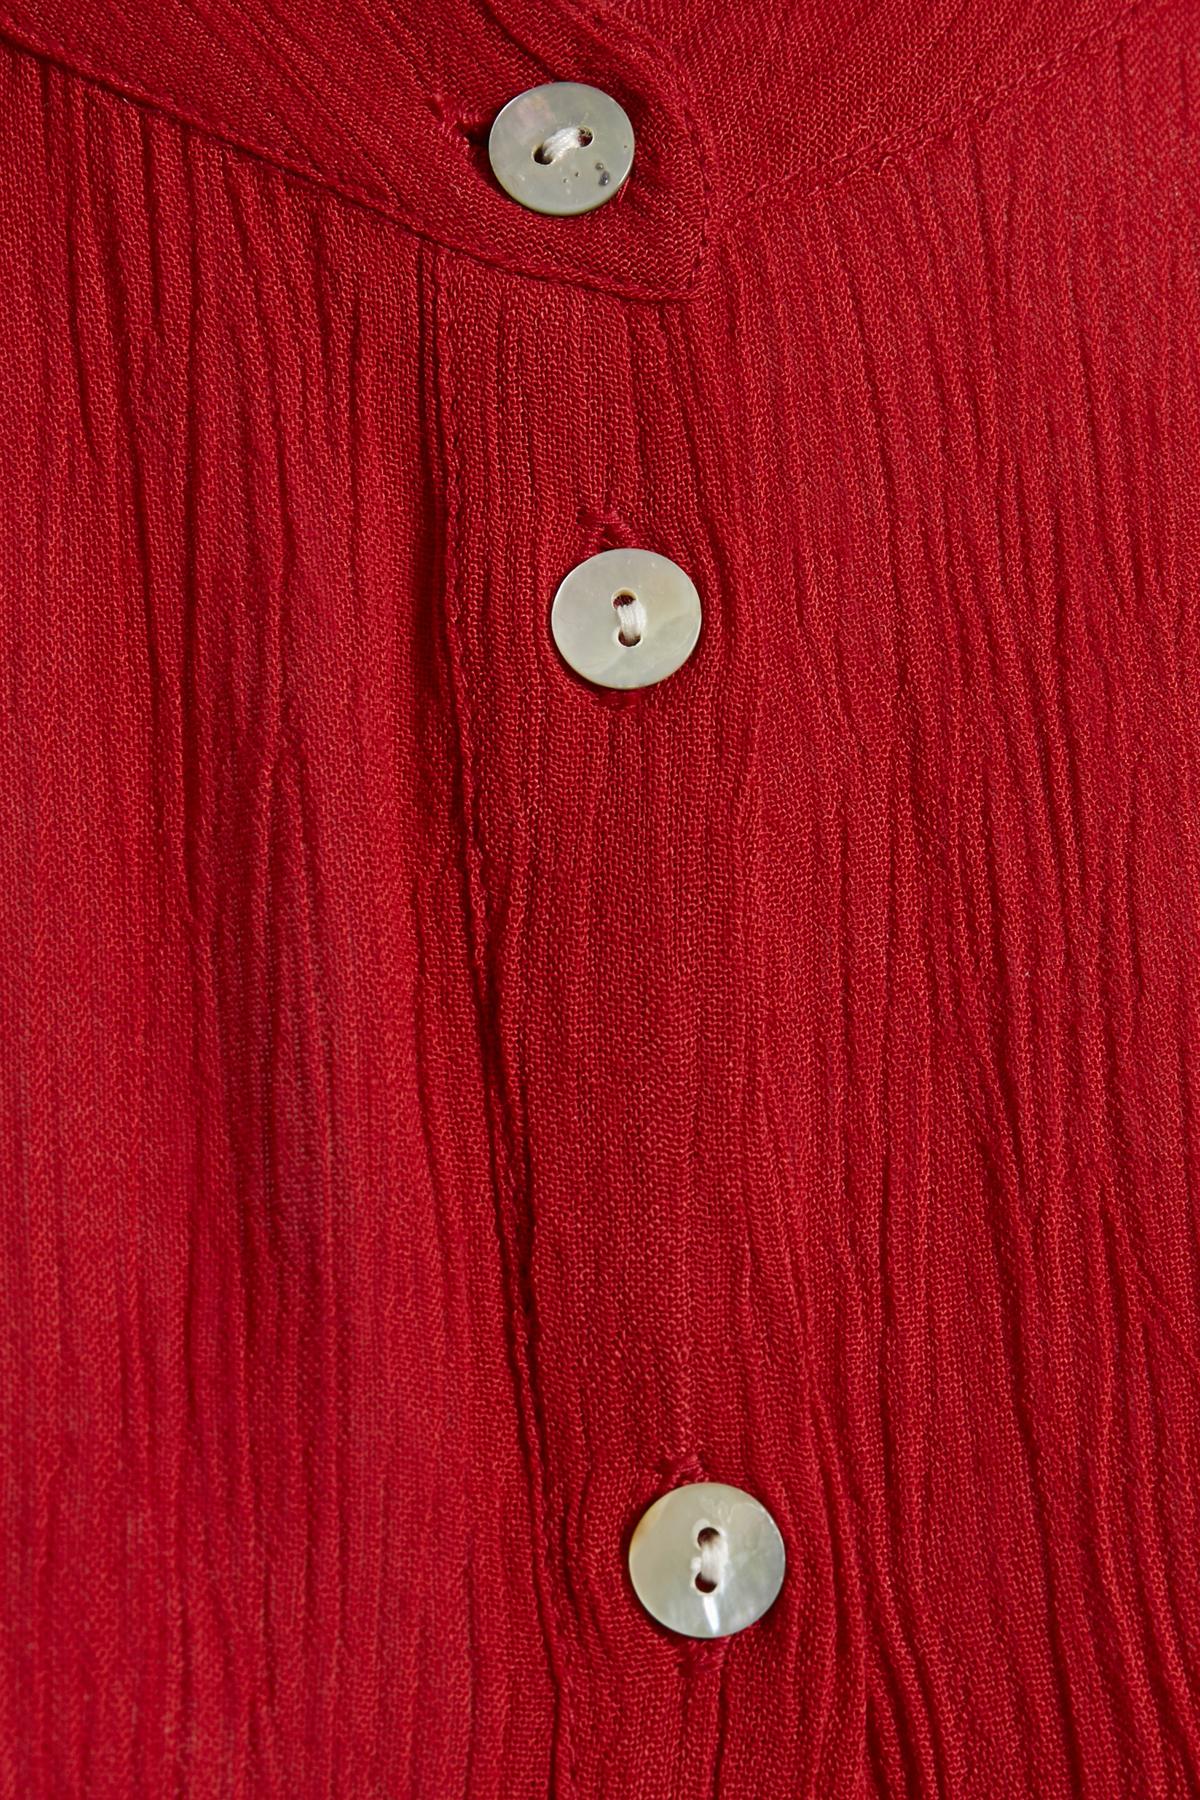 Röd Långärmad blus från Kaffe – Köp Röd Långärmad blus från stl. 34-46 här